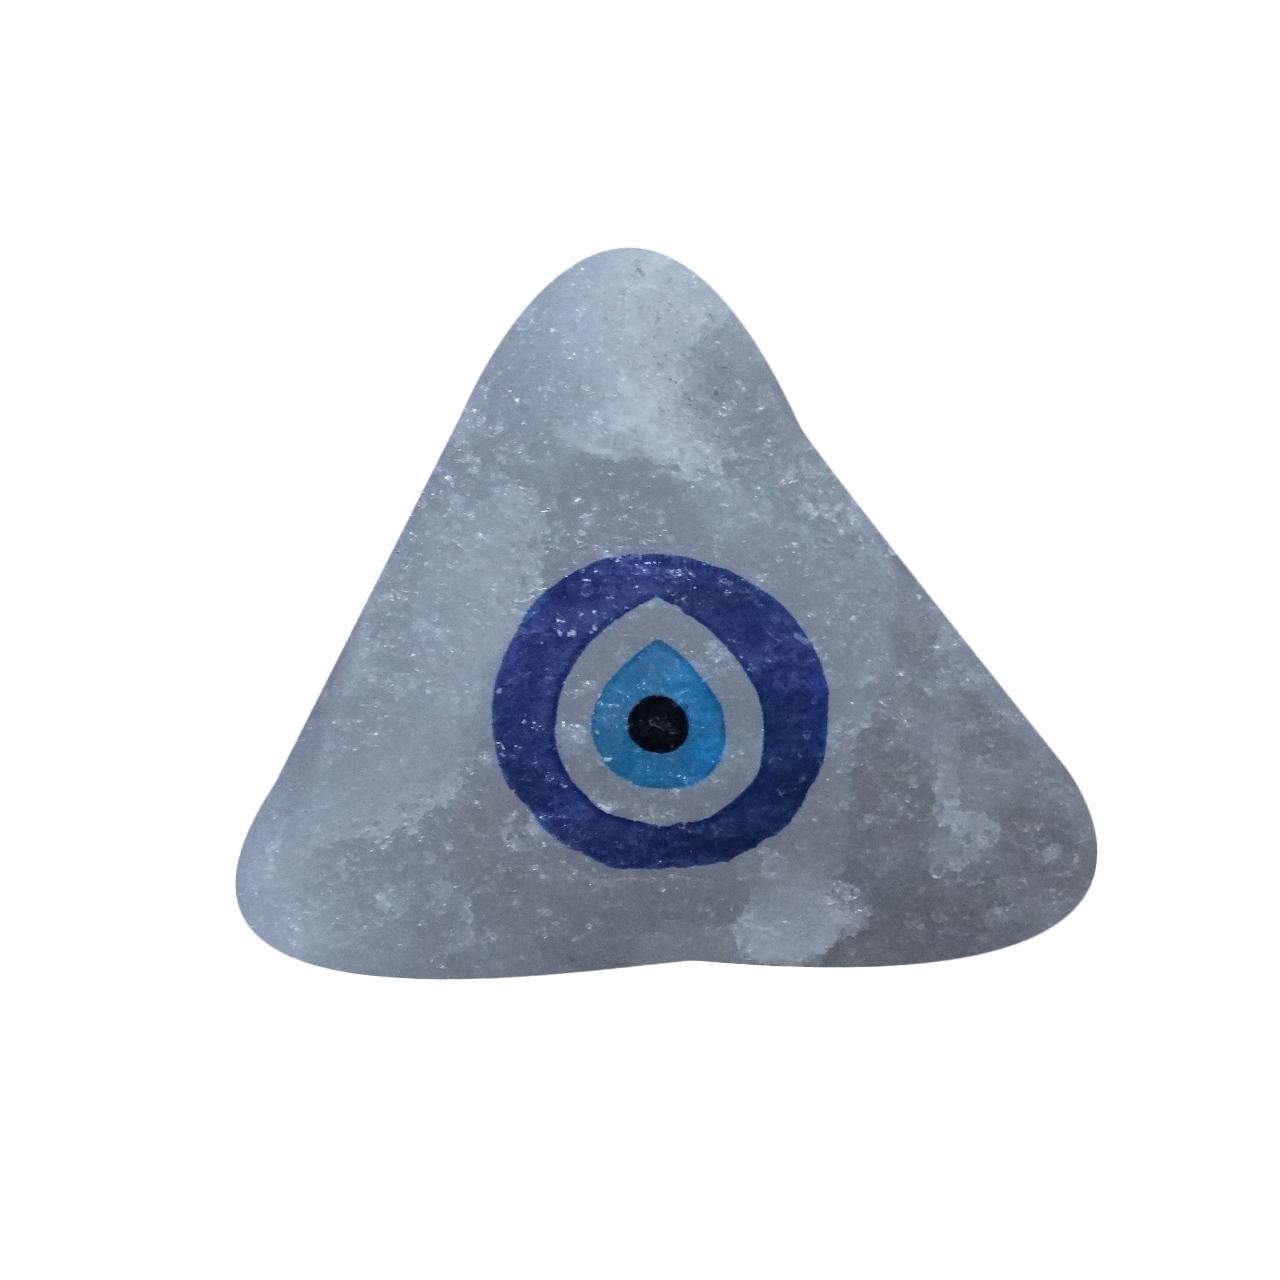 سنگ نمک دکوری طرح چشم زخم کد SNC01